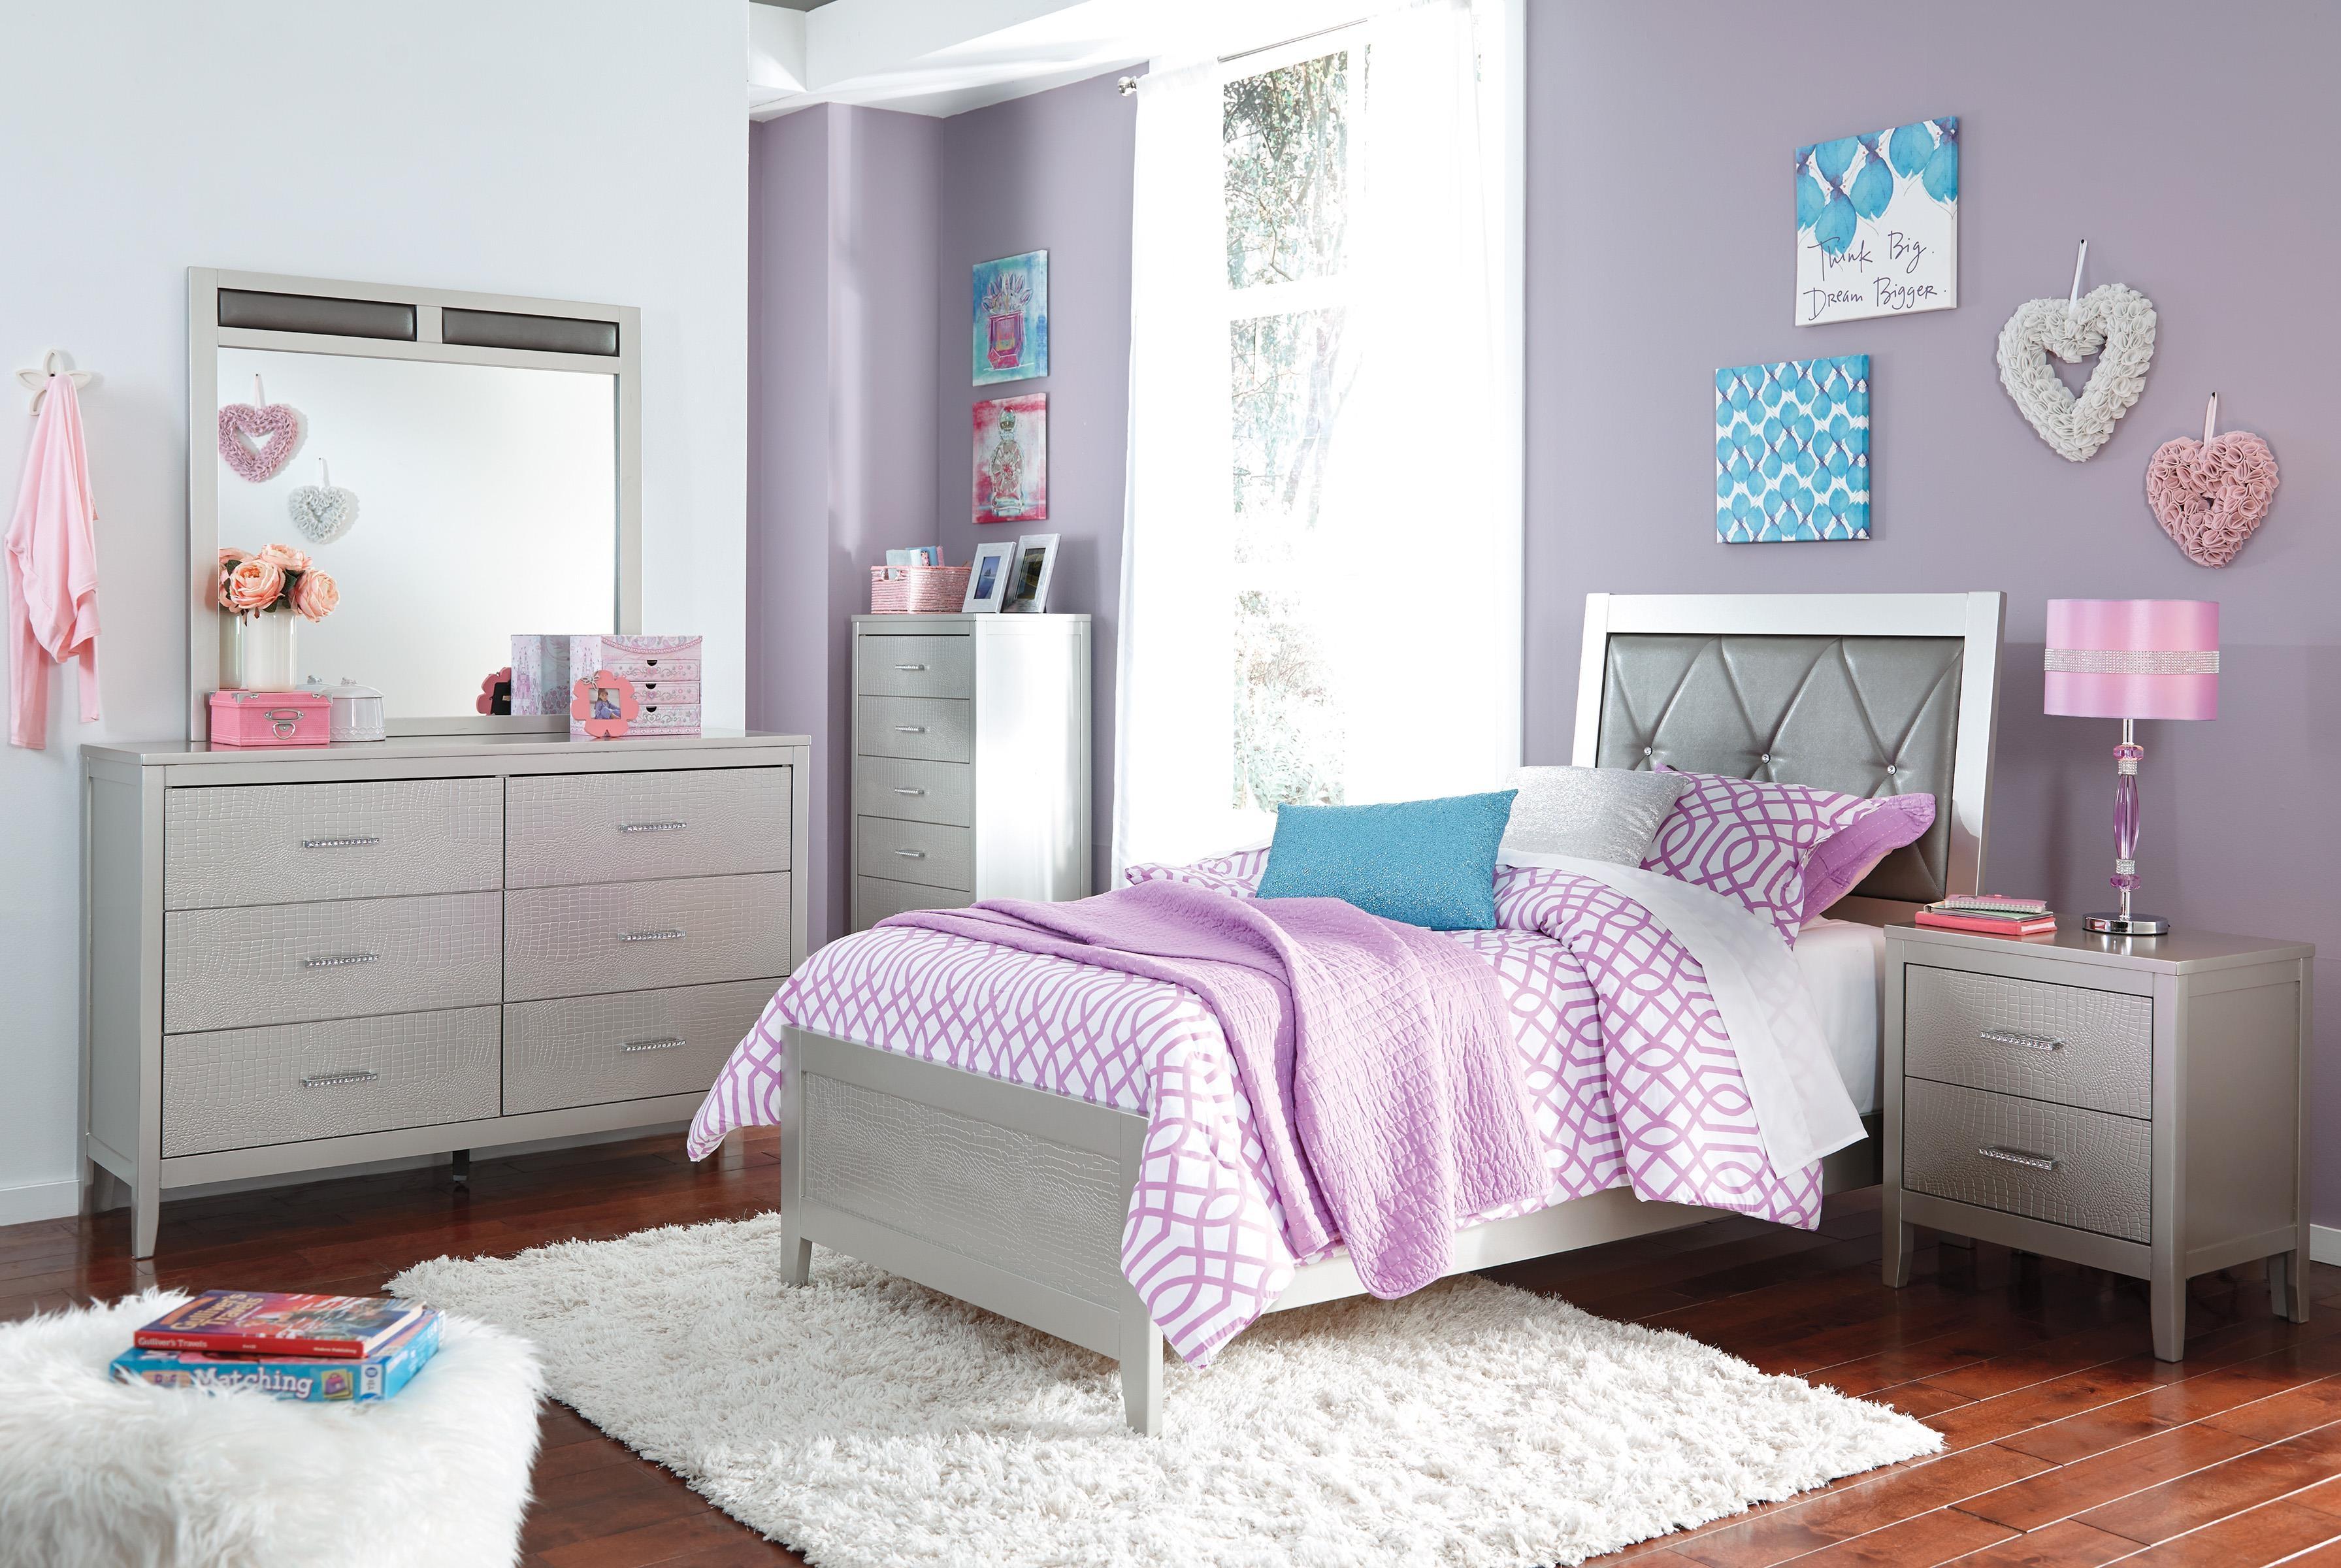 Ashley Olivet 5pc Bedroom Set: Headboard, Footboard, Rails, Dresser, And  Mirror